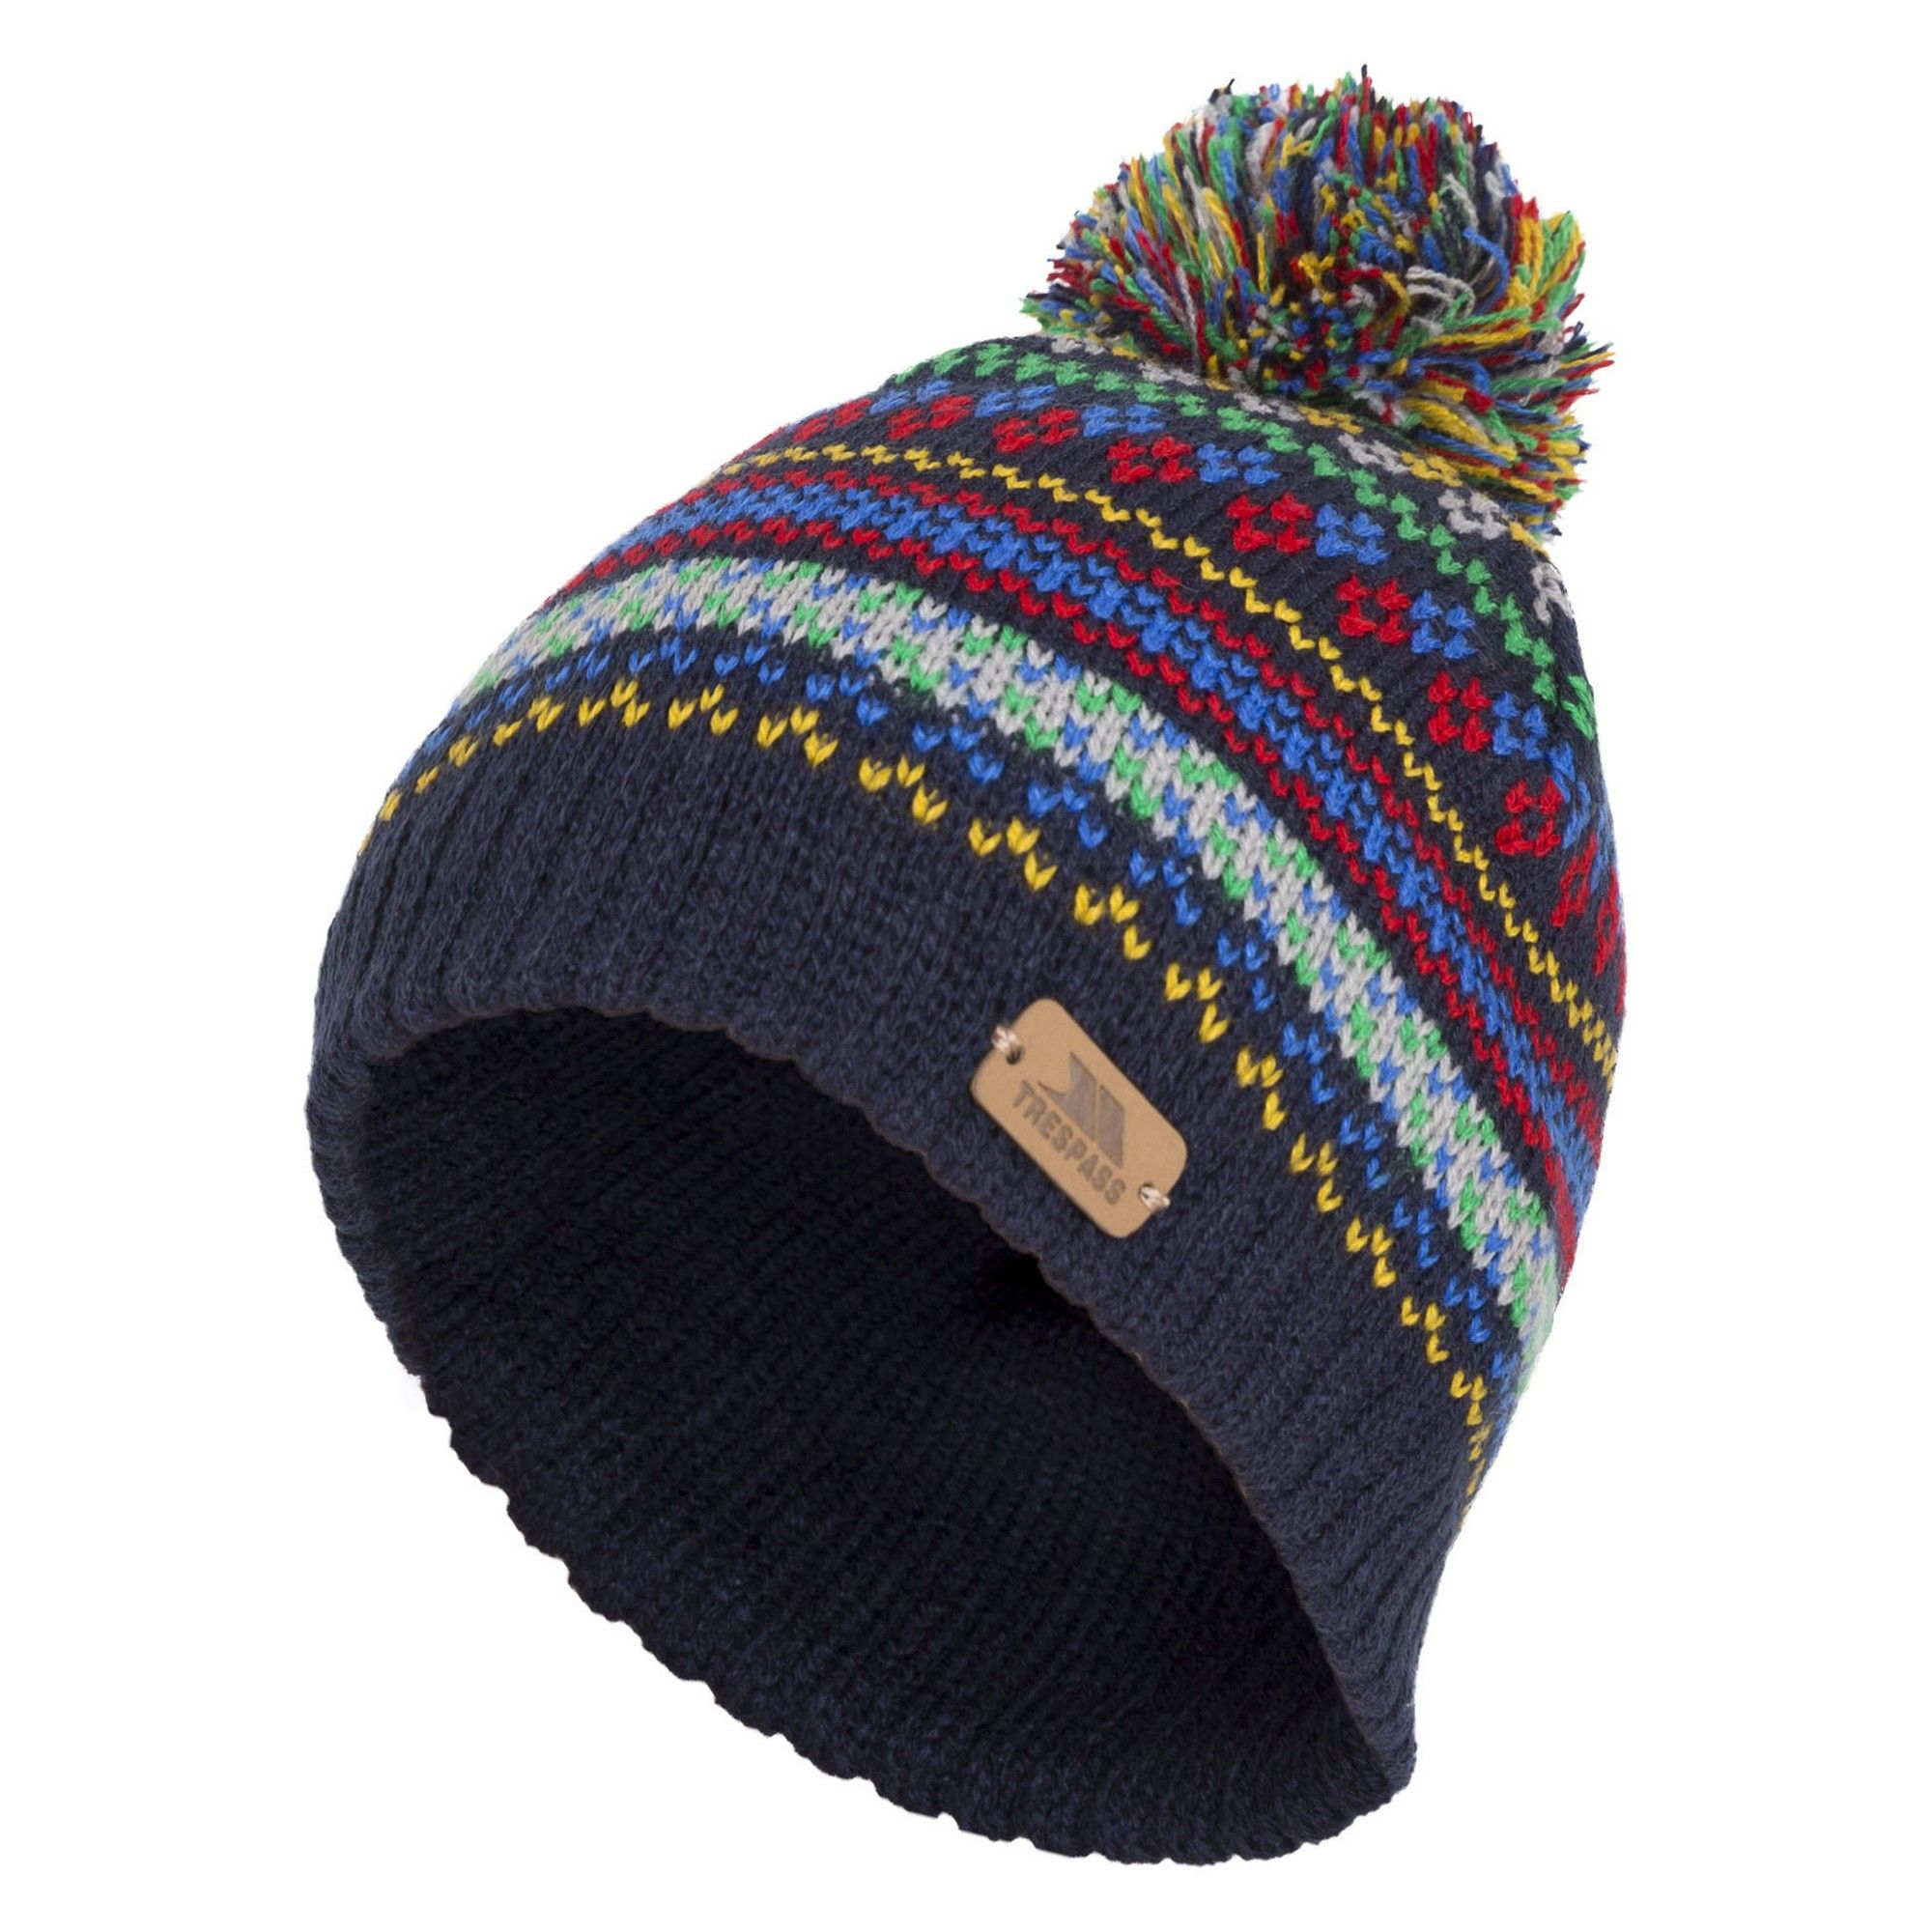 Trespass Childrens/Kids Garrity Knitted Pom Pom Hat